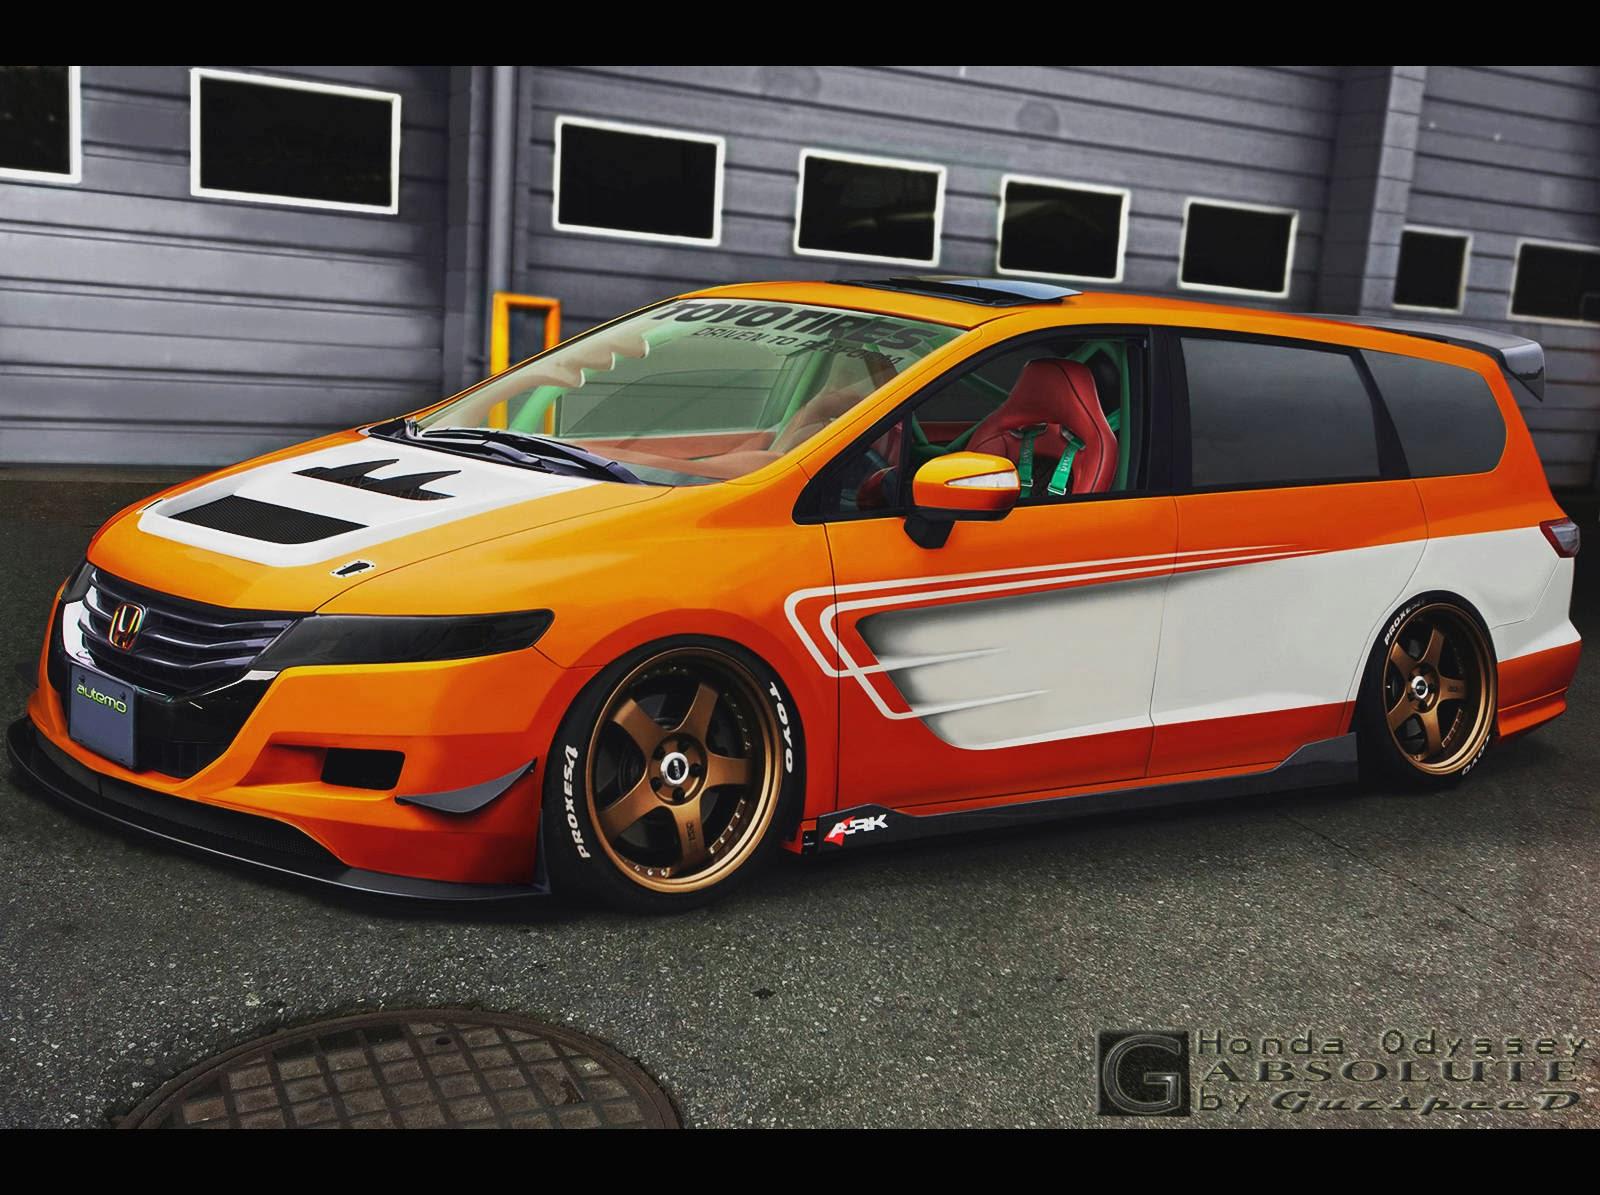 Modification Modifikasi Honda Odyssey Absolute Racing No